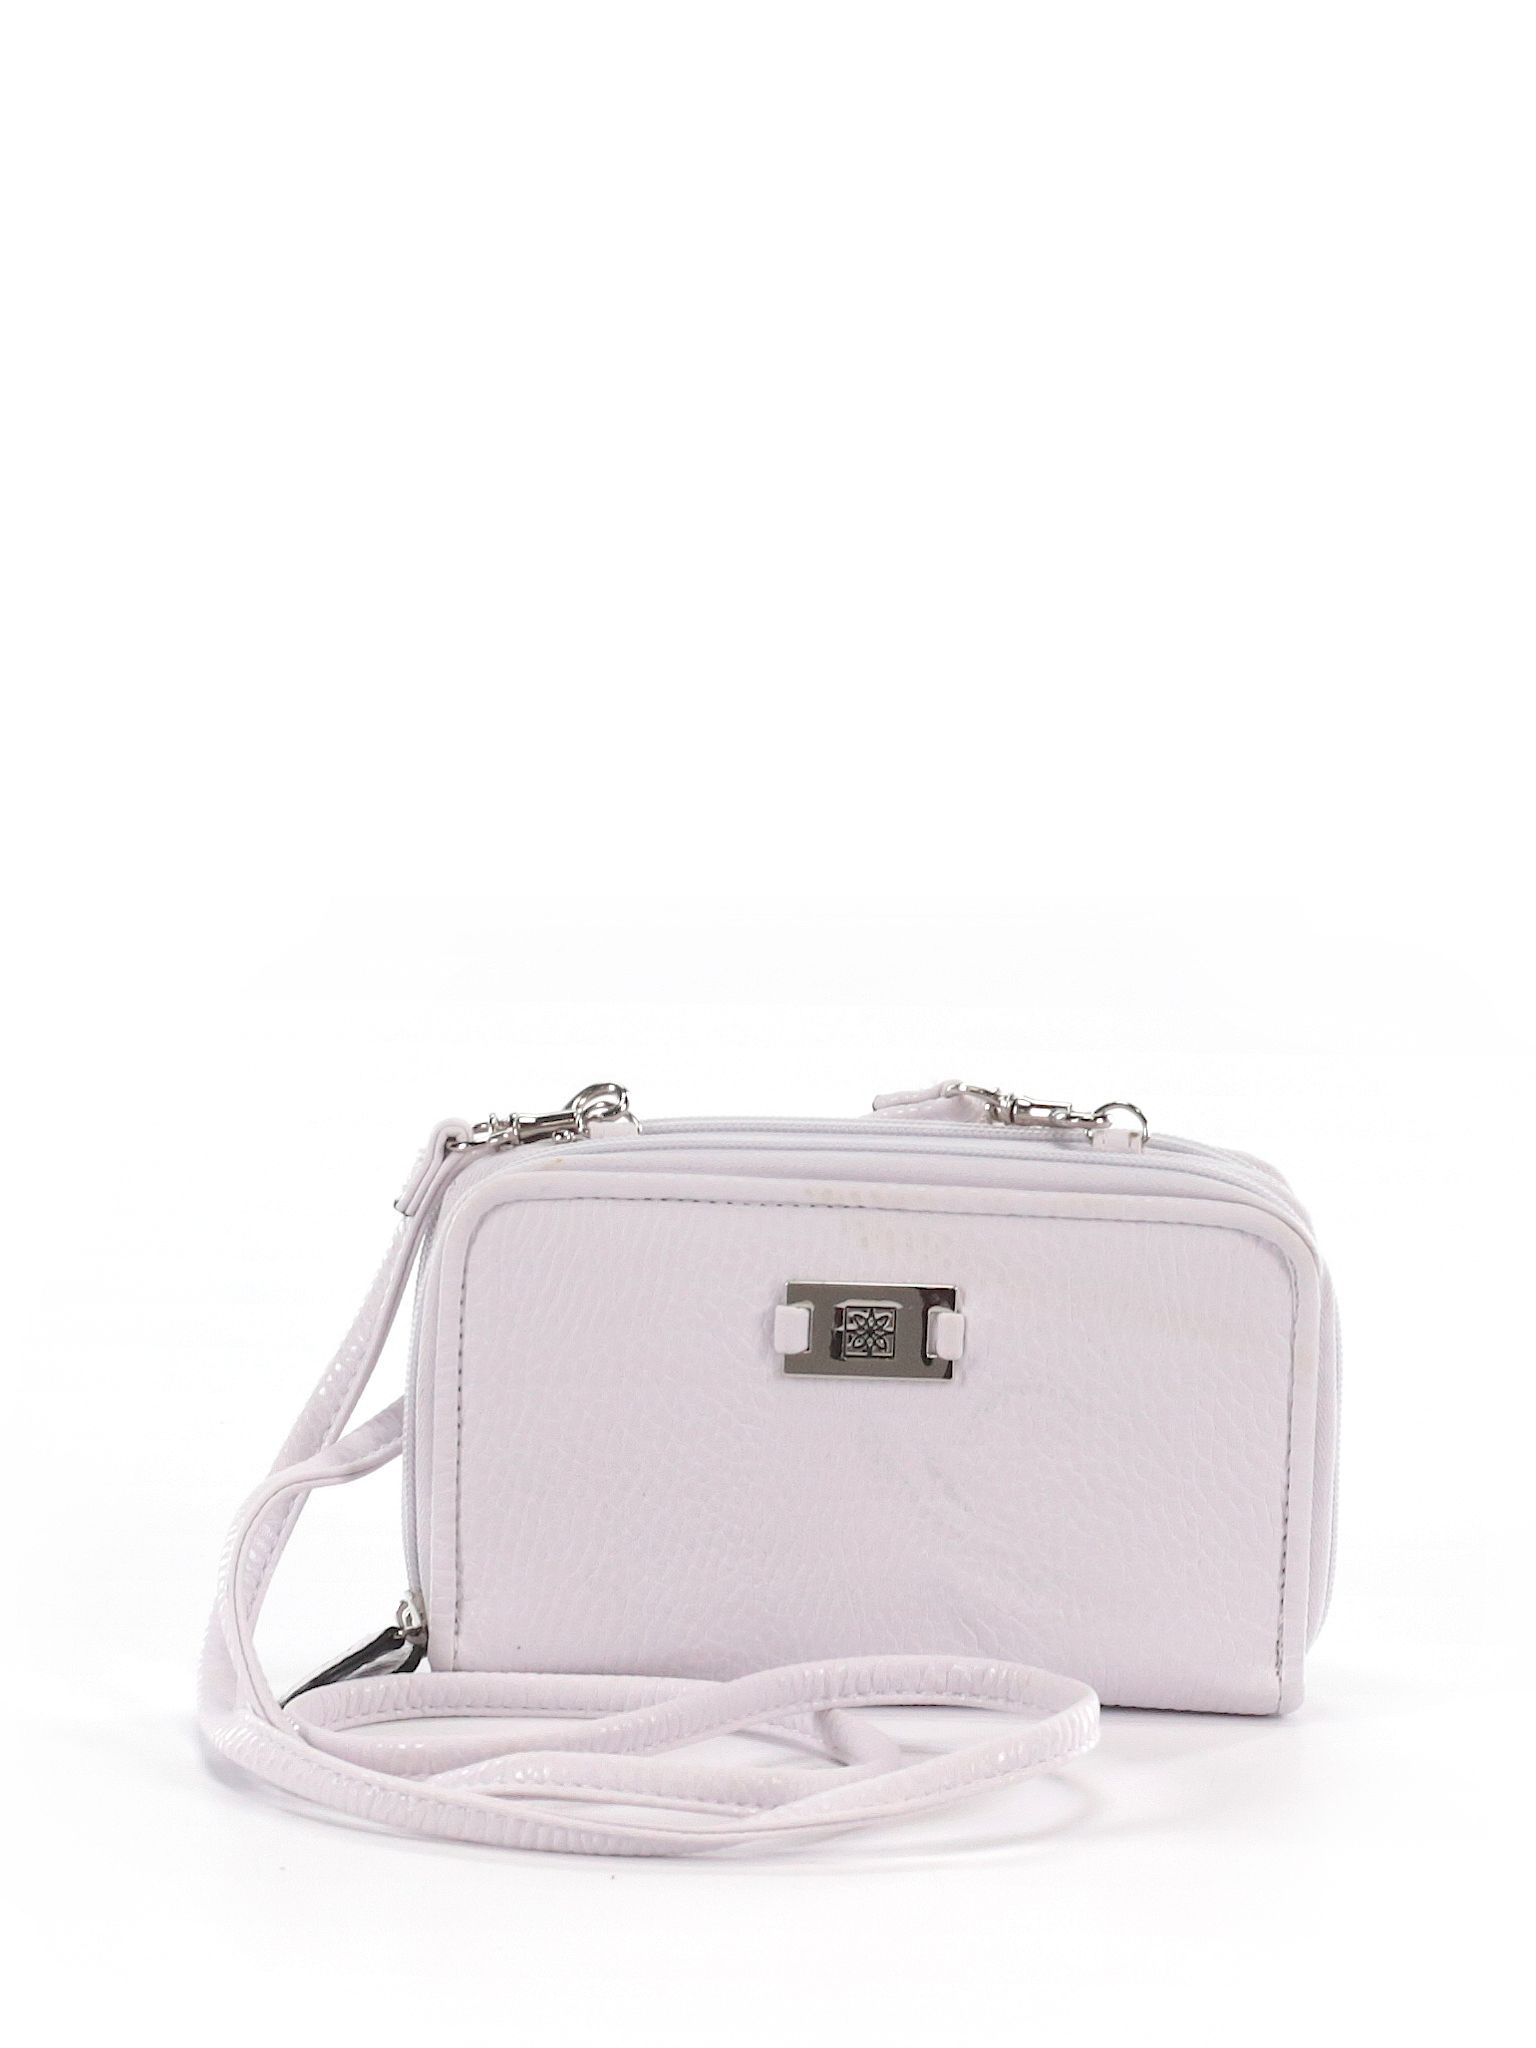 2f7a52c8d Unbranded Handbags Crossbody Bag: Size NA White Women's Bags - $27.99